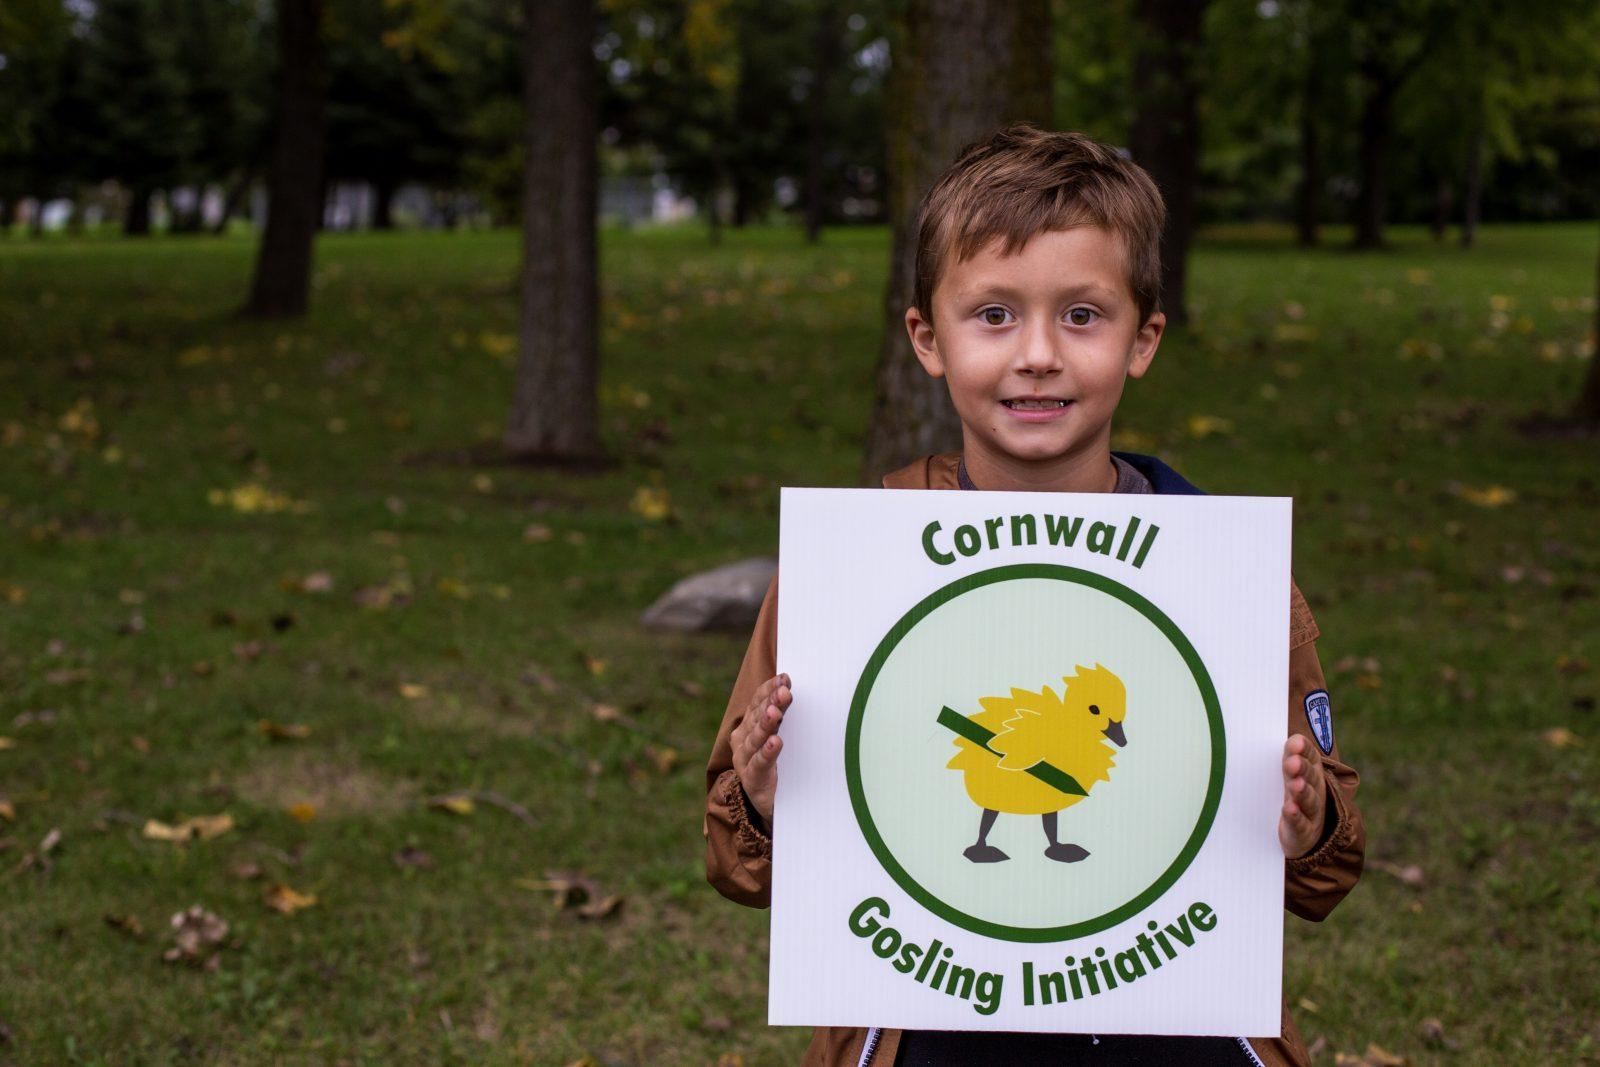 Goslings Initiativefinishesuptheir first Children's Art Contest